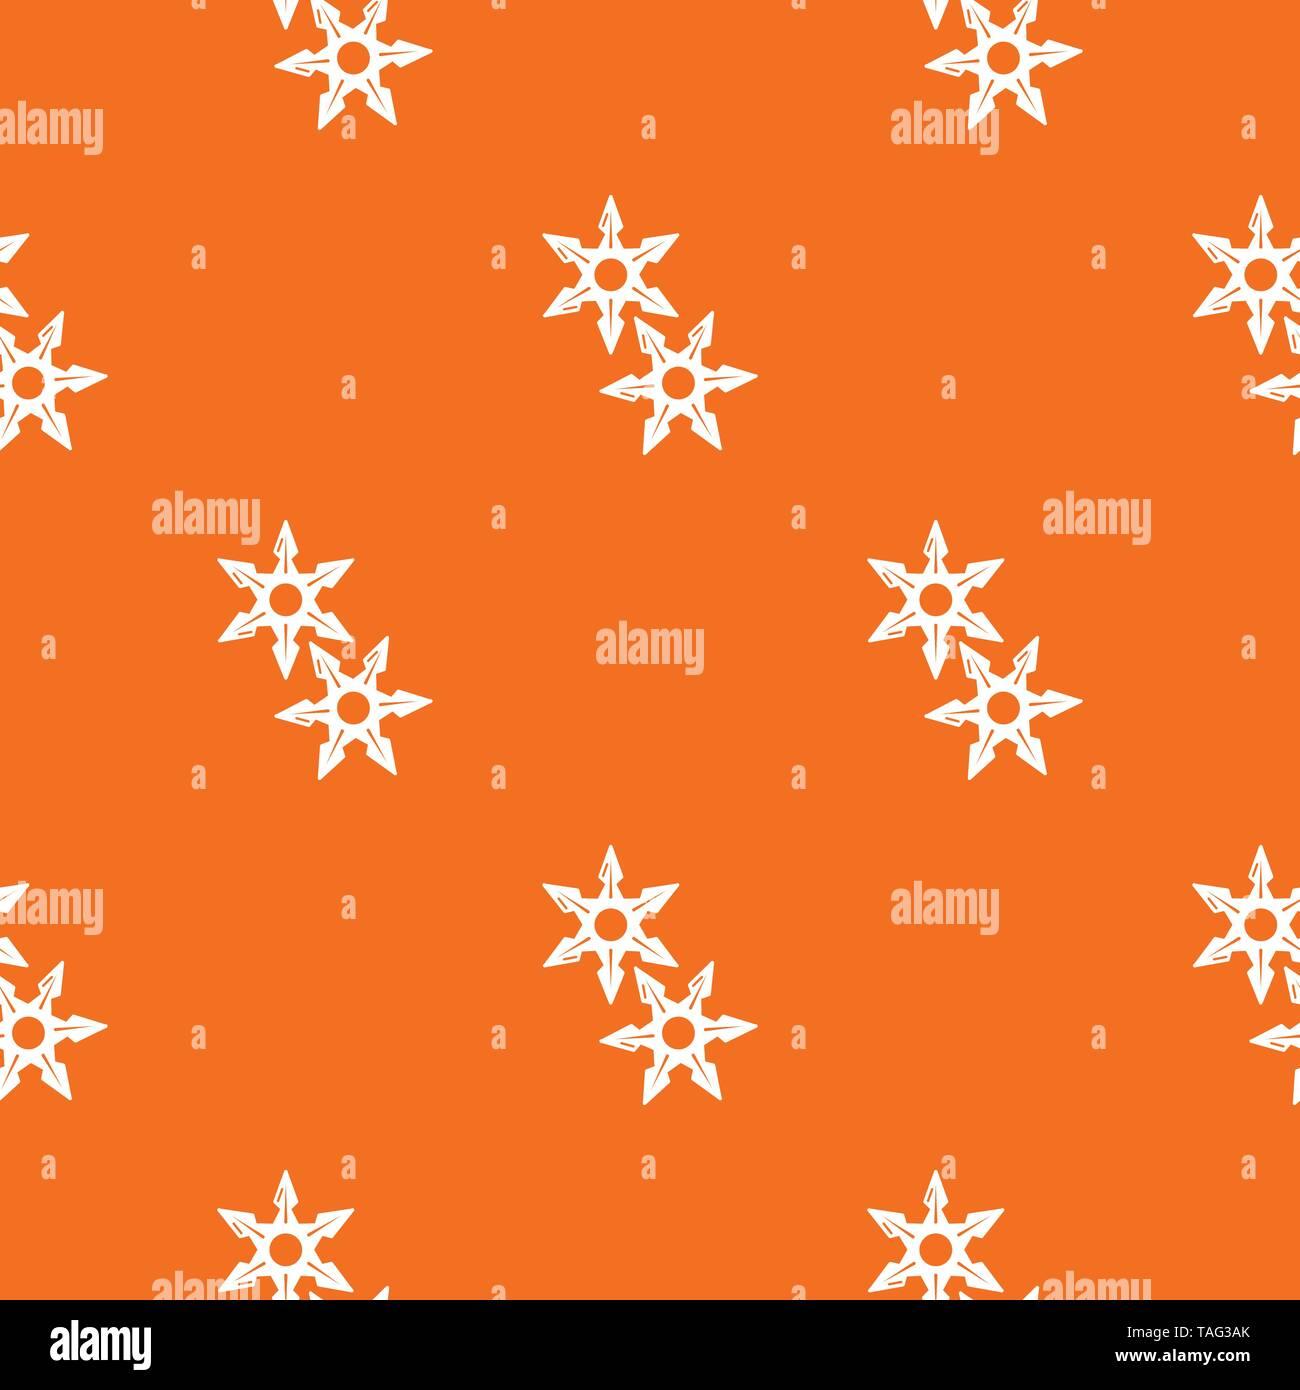 Ninja stars pattern vector orange - Stock Image